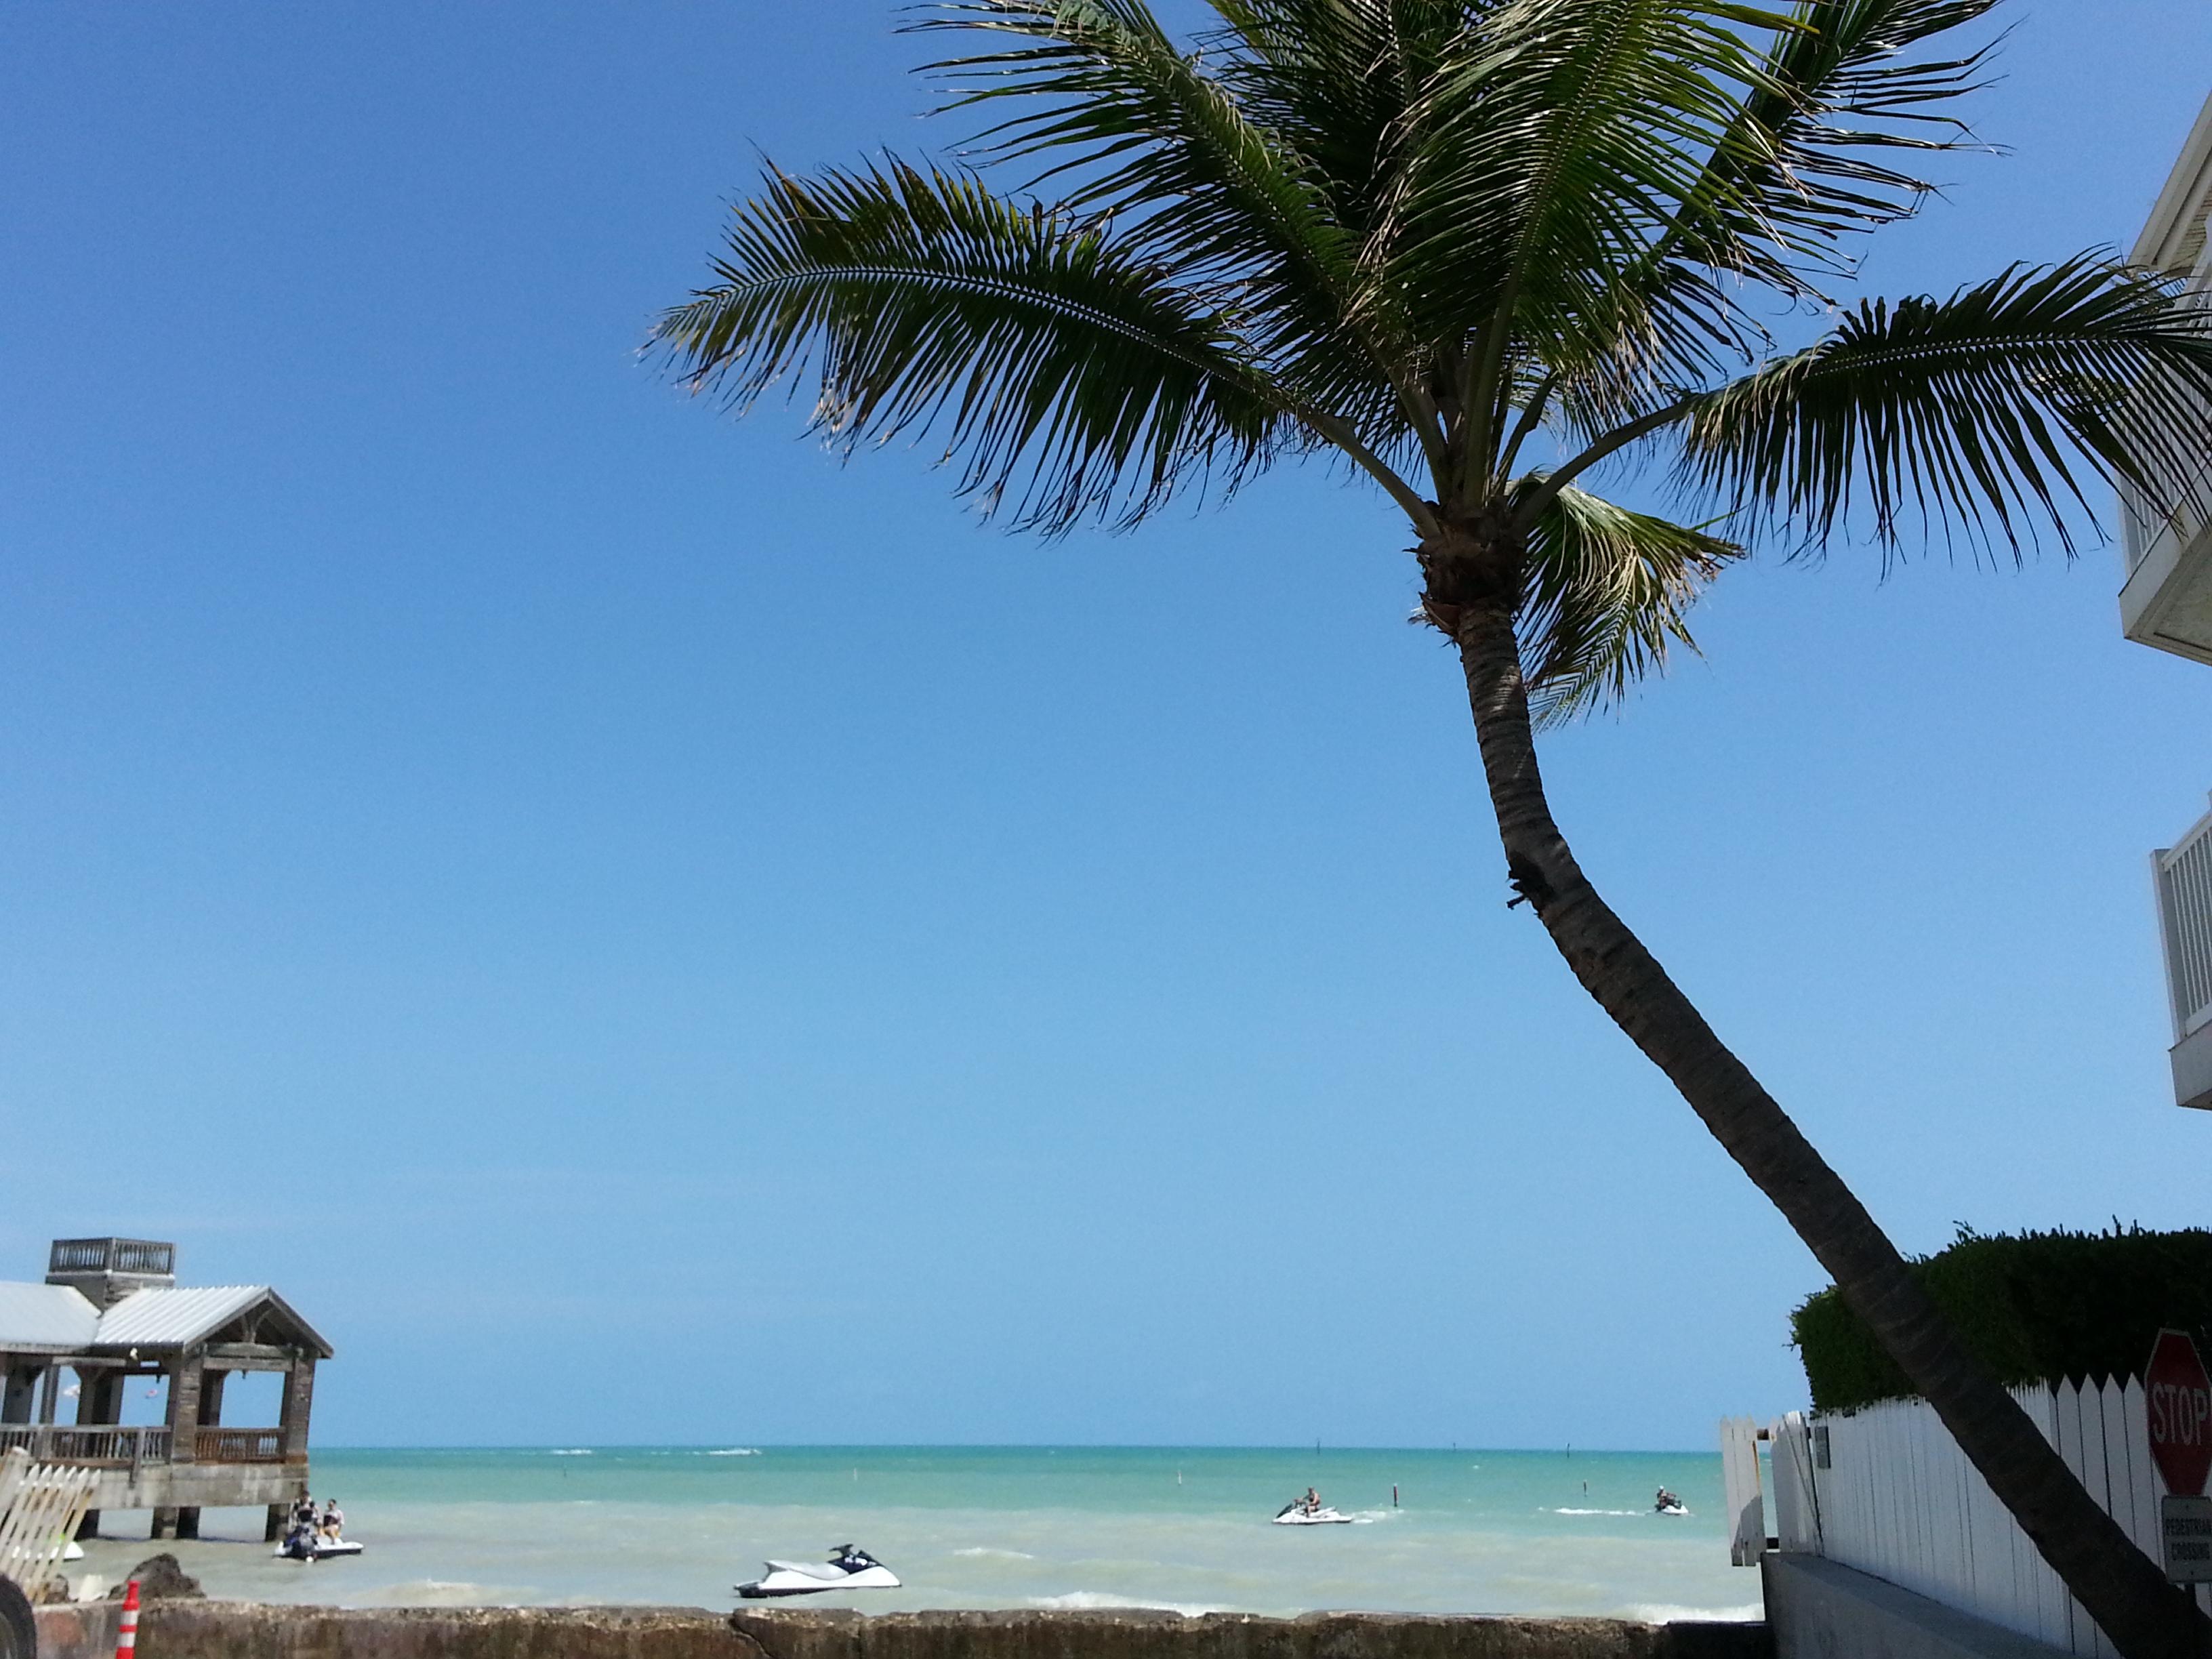 plage key west